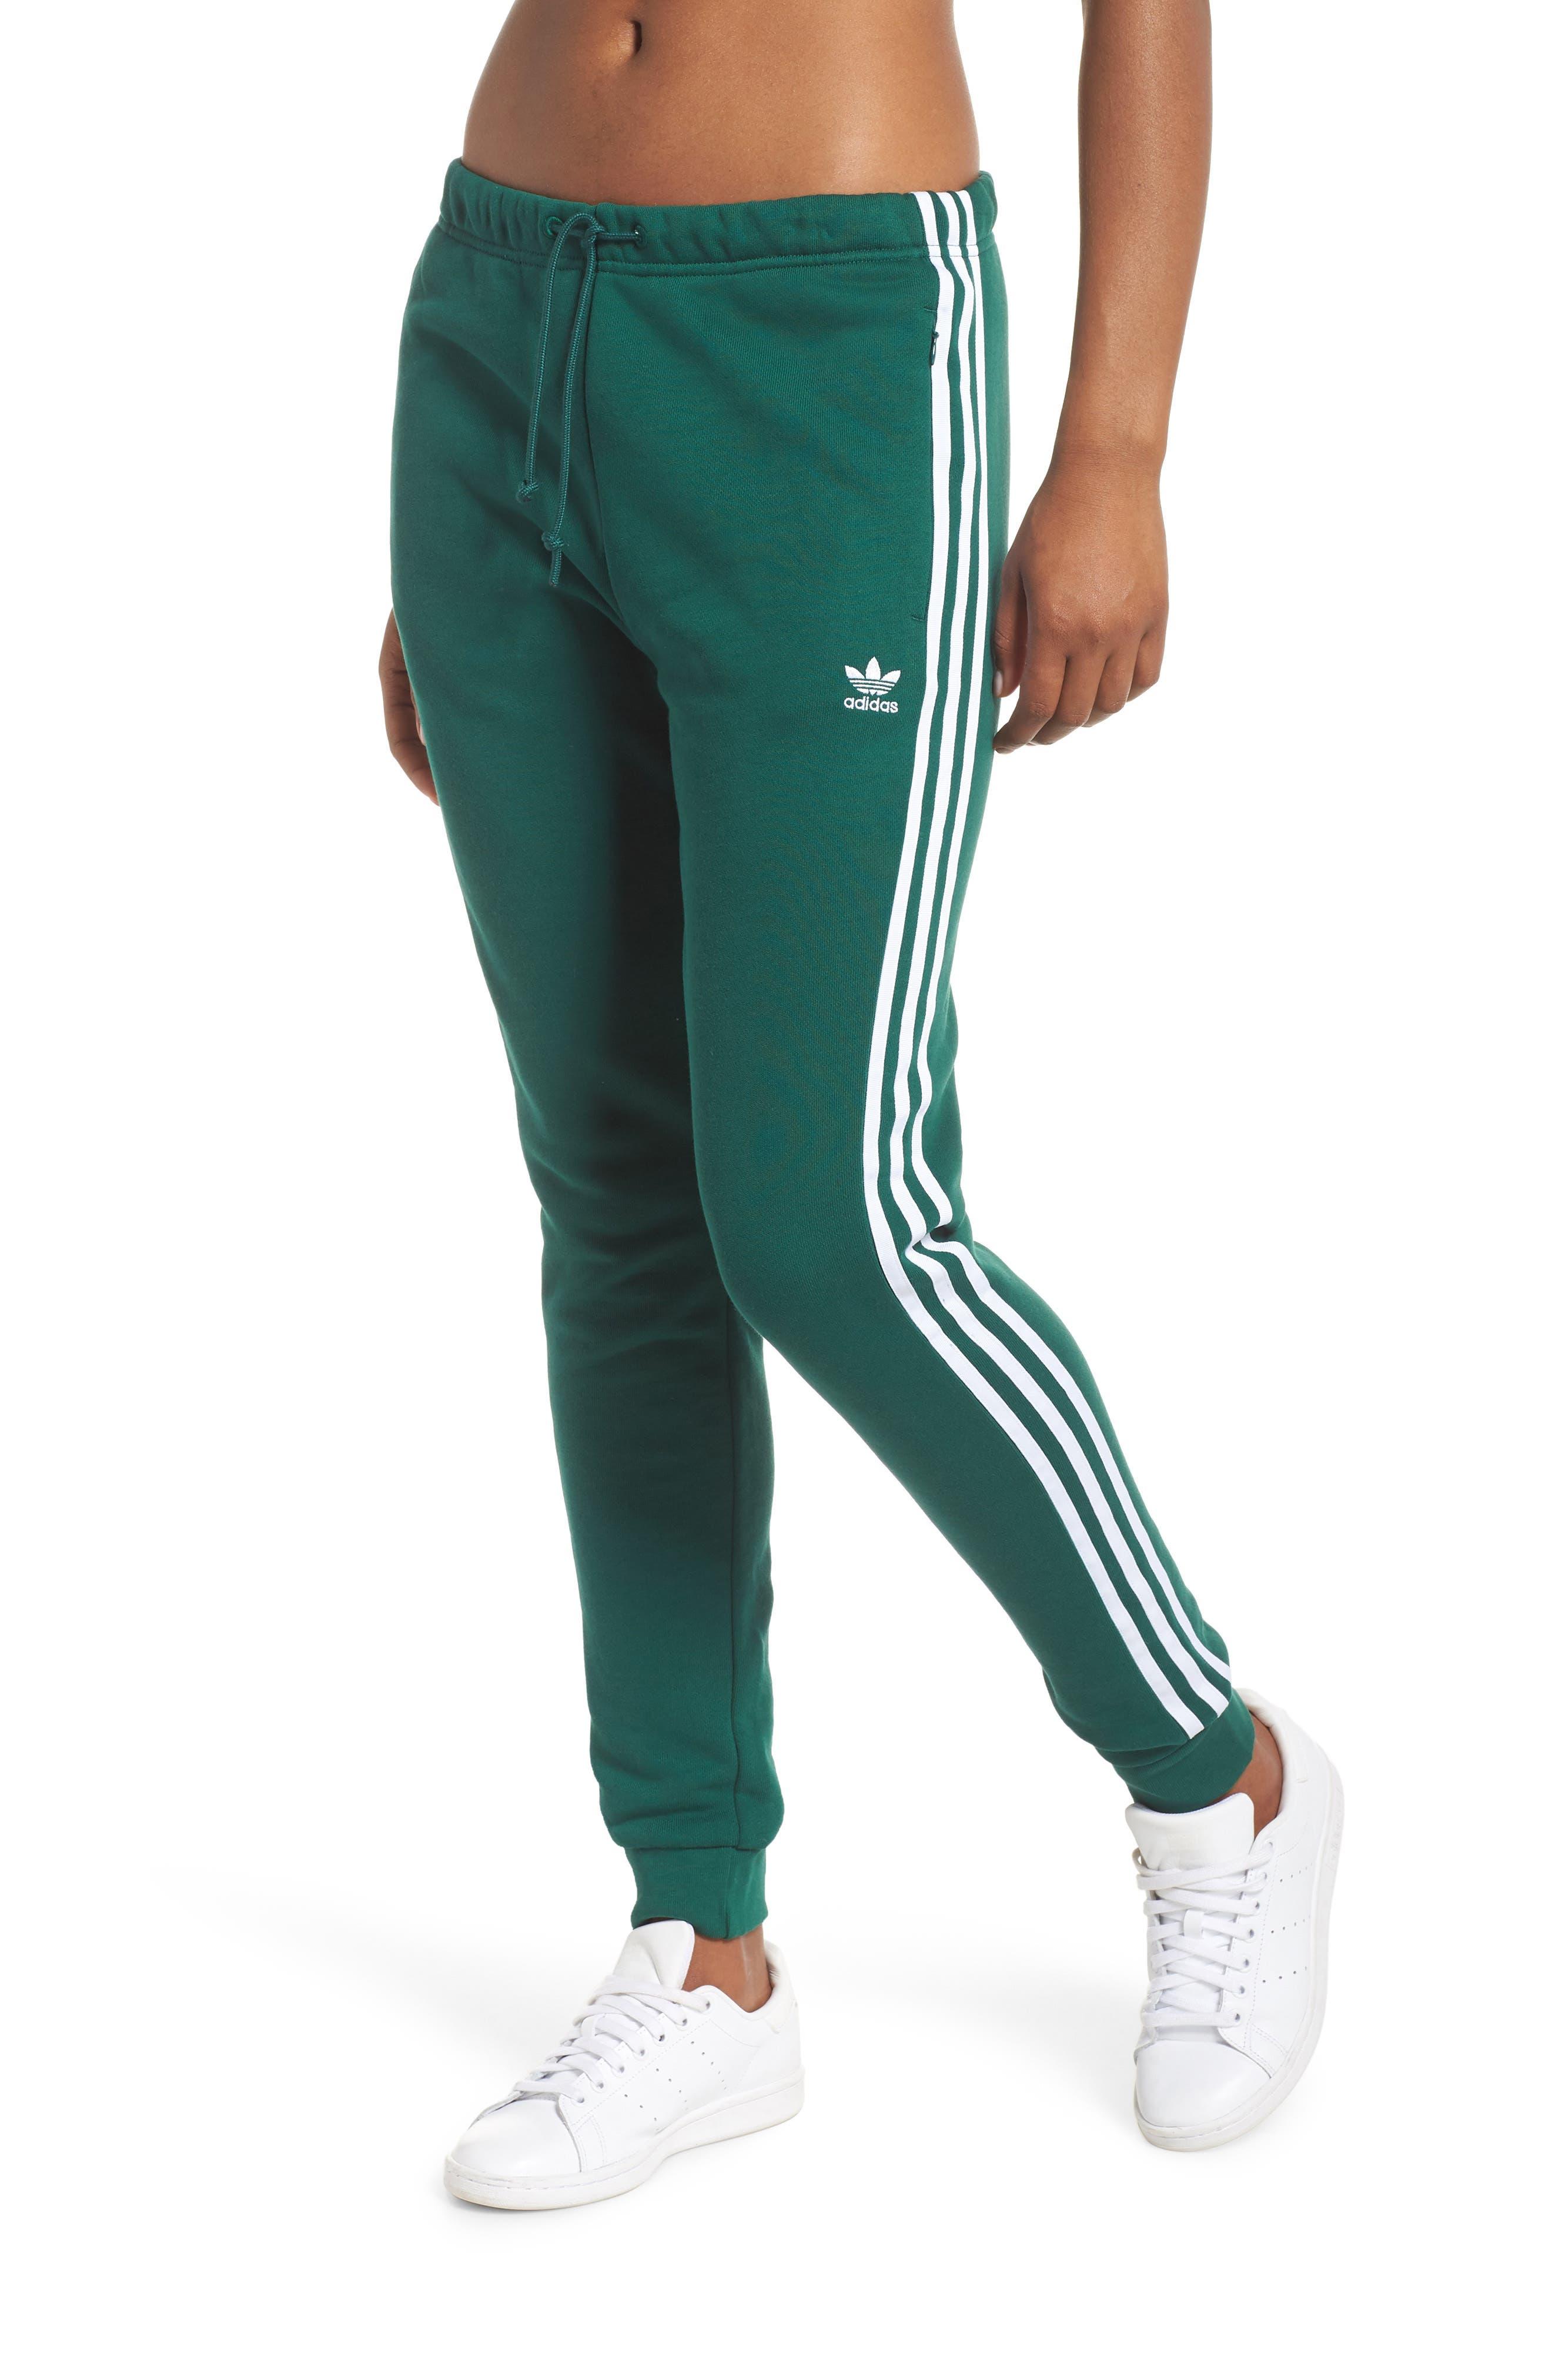 ADIDAS ORIGINALS Cuffed Track Pants, Main, color, 305